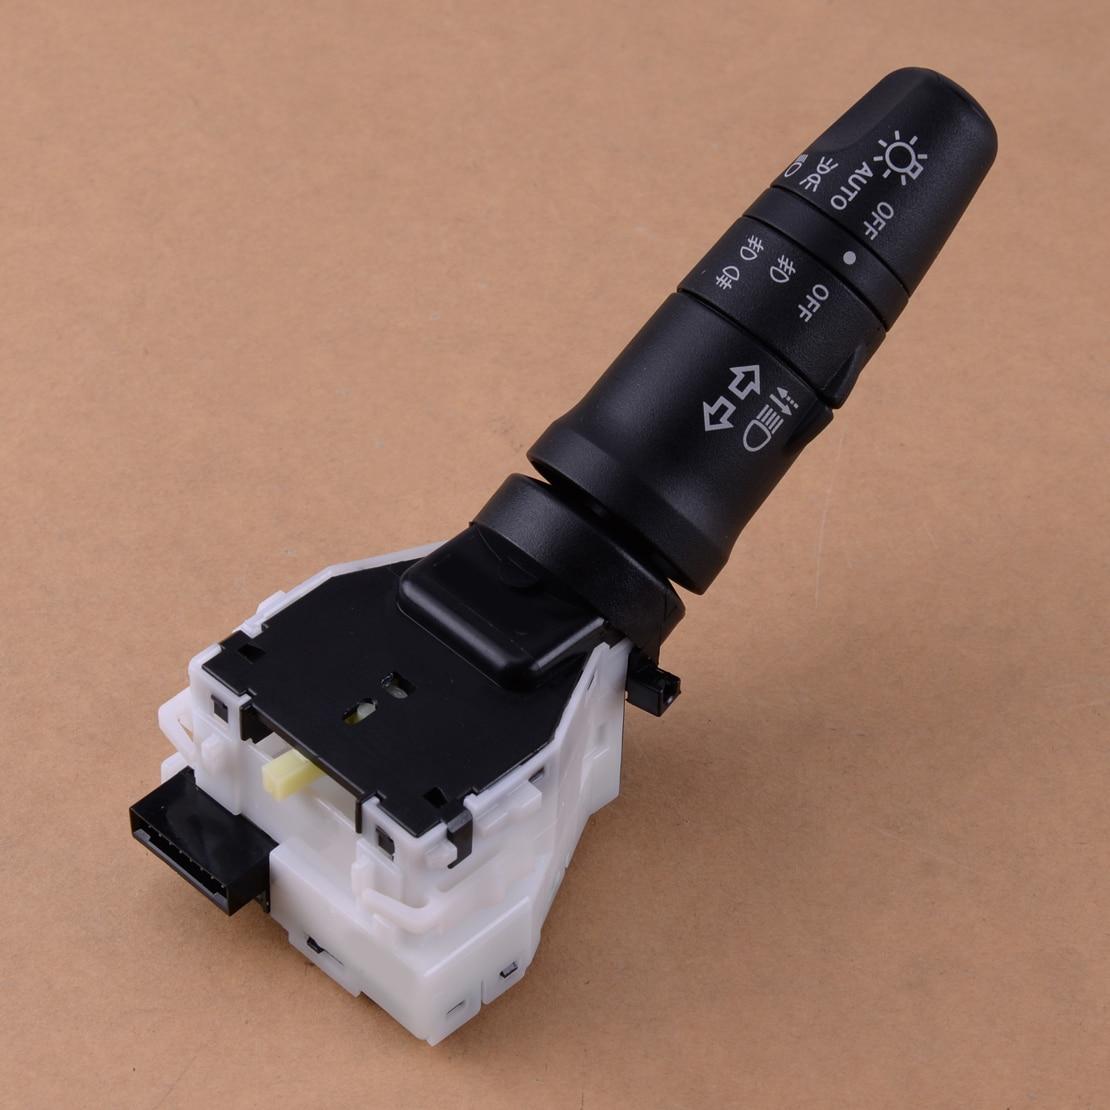 Car Headlight Turn Signal Fog light Steering Column Switch Fit for Nissan Frontier Xterra 999F1KV000